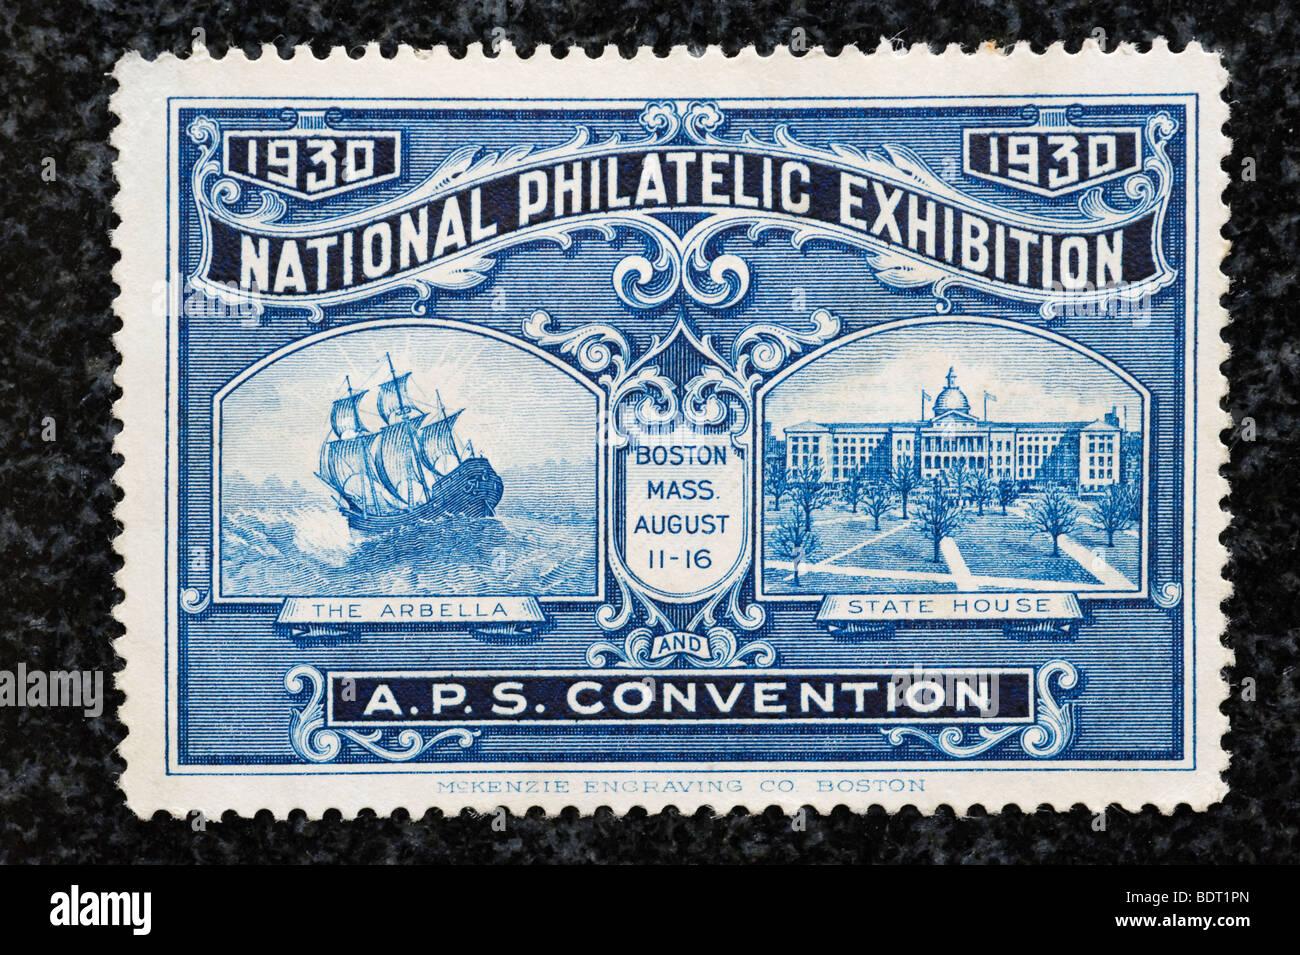 1930 National Philatelic Exhibition stamp - Stock Image